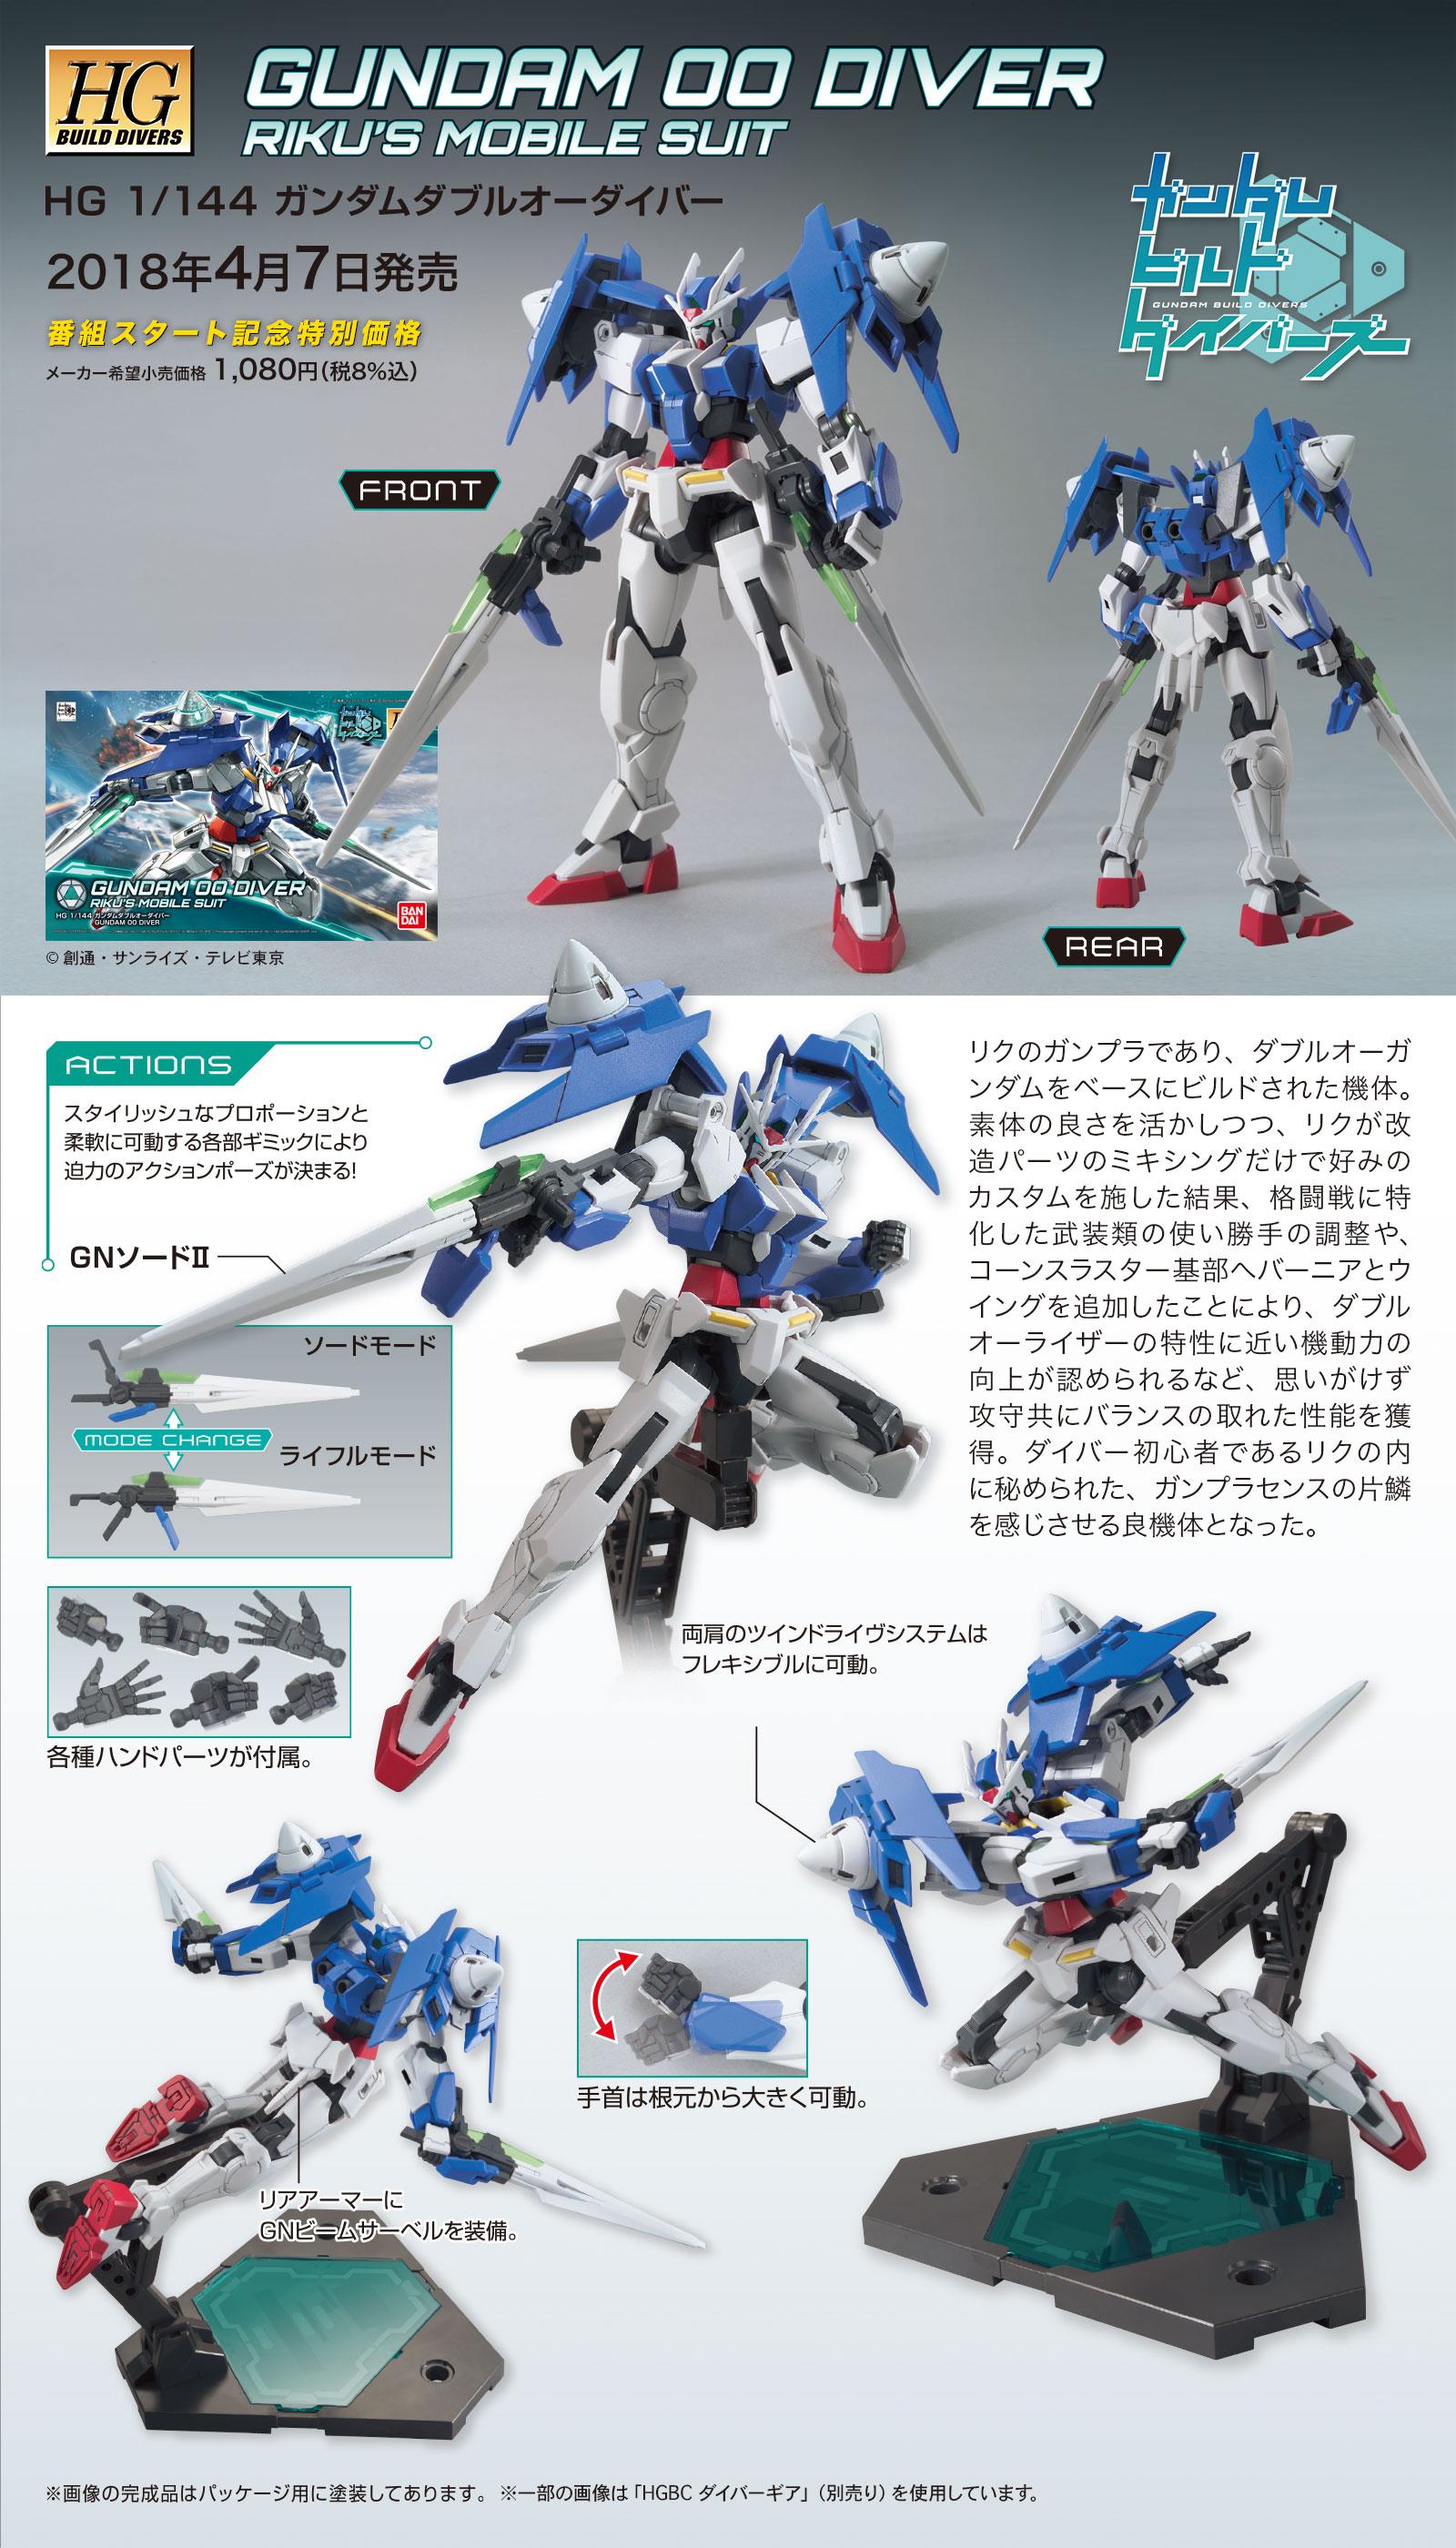 HGBD 000 1/144 GN-0000DVR ガンダムダブルオーダイバー [Gundam 00 Diver] 公式商品説明(画像)